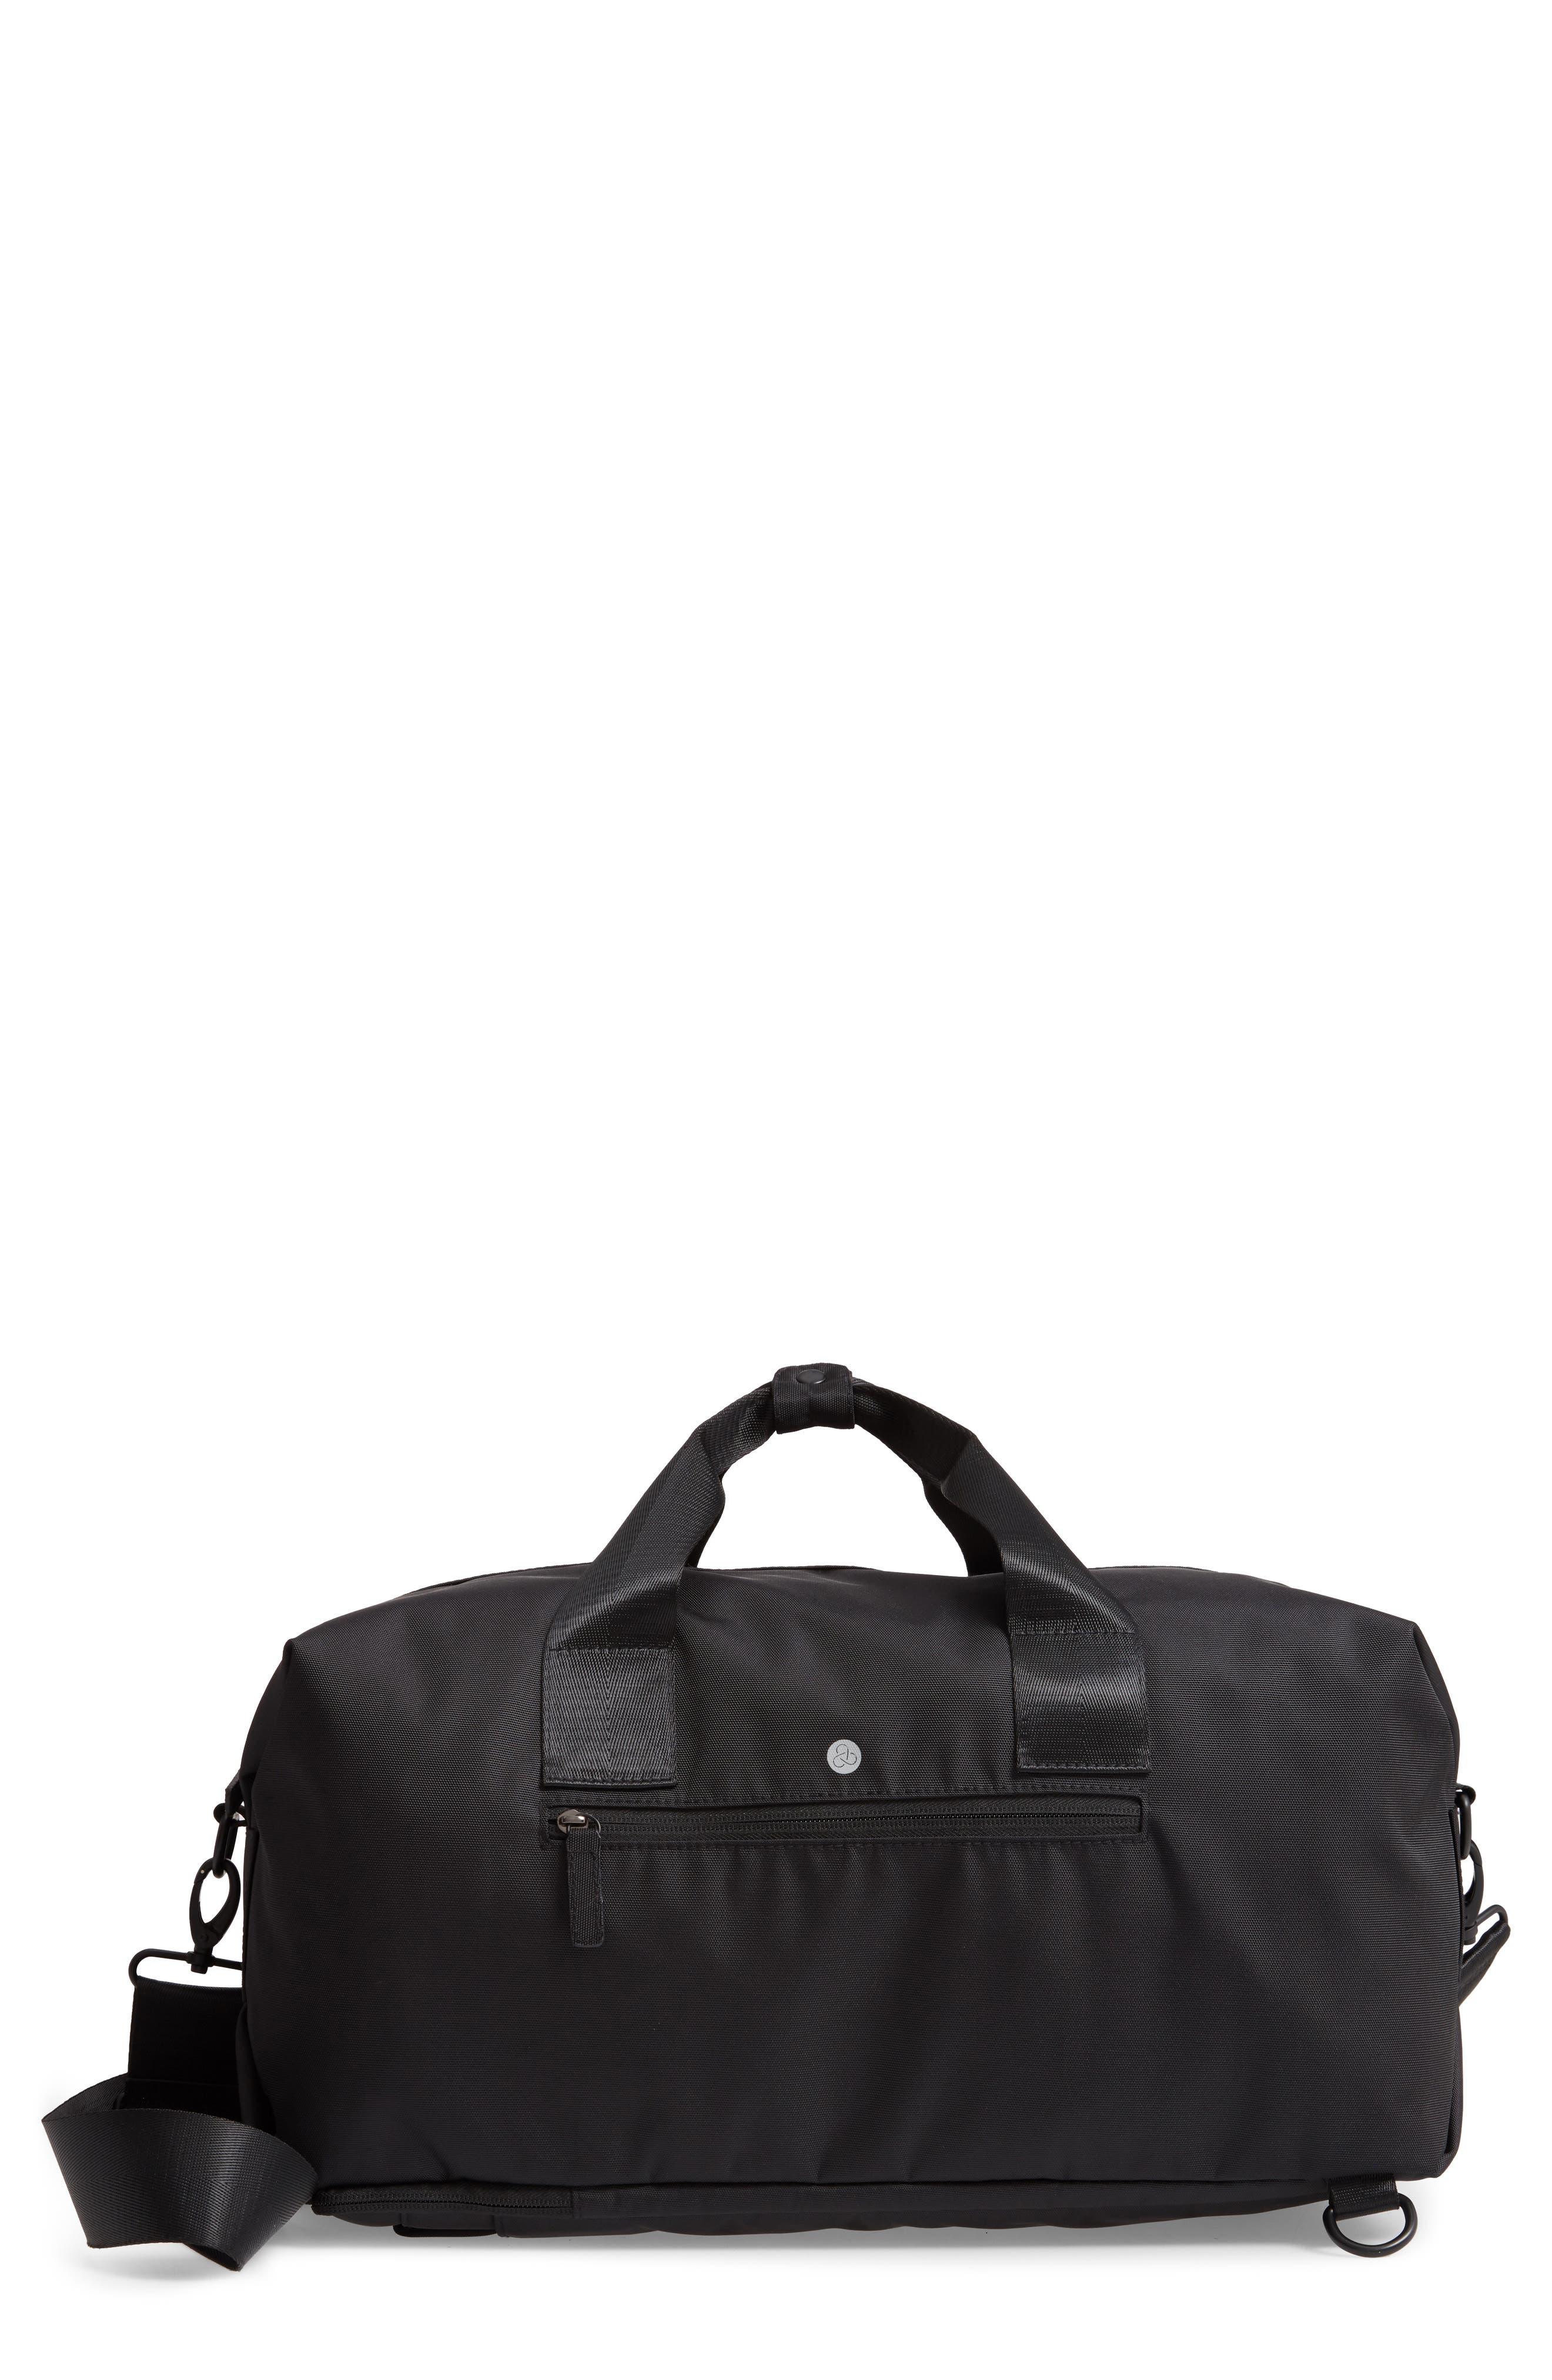 Convertible Duffle Backpack, Main, color, 001